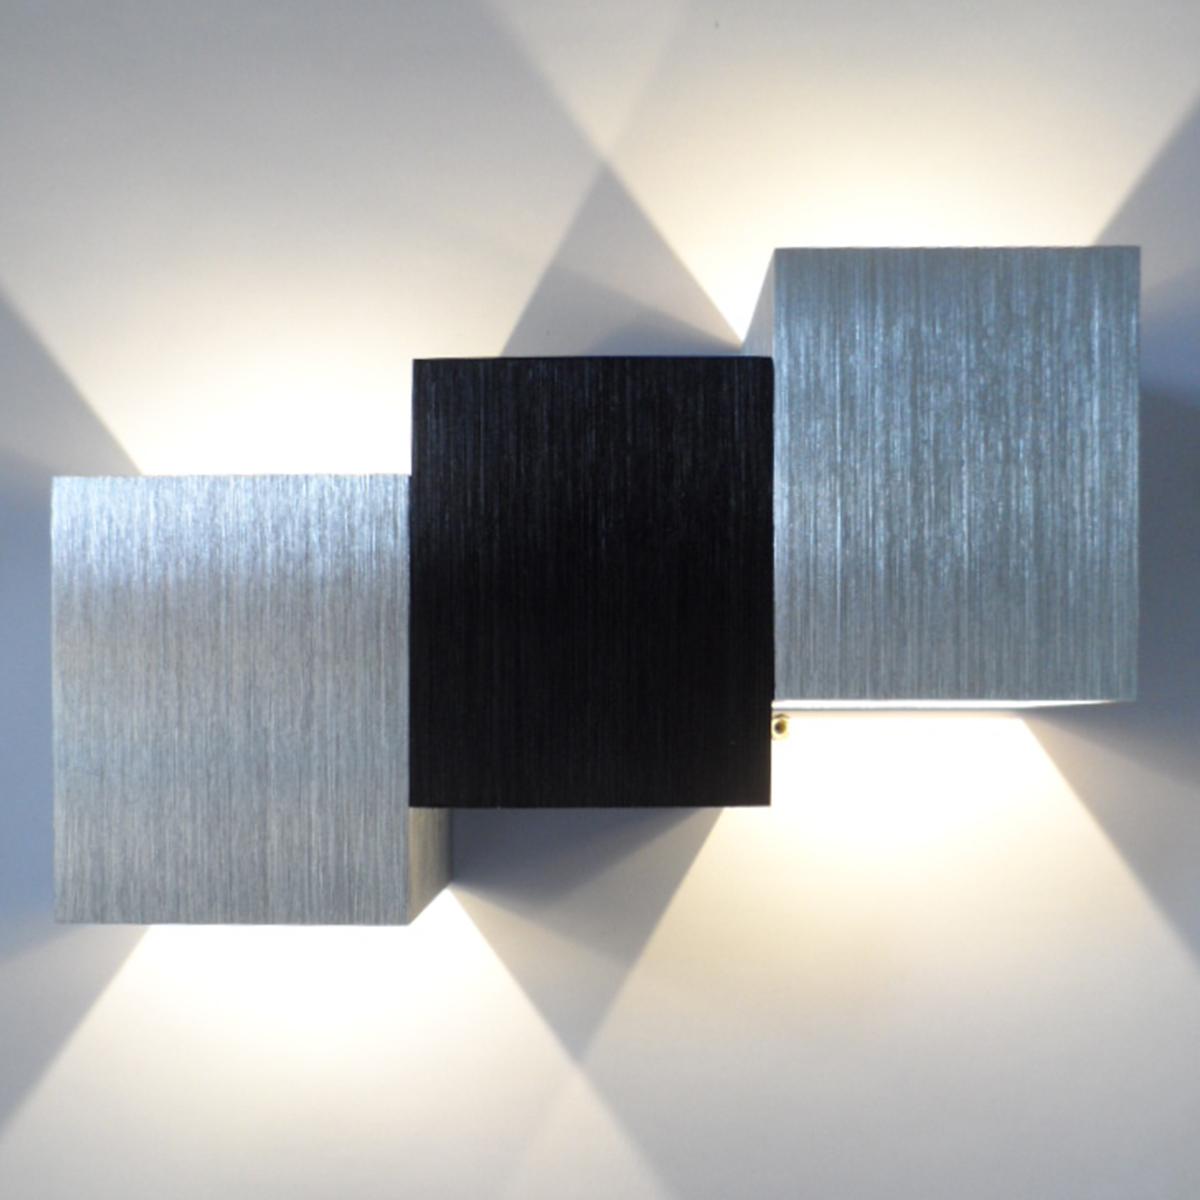 wandleuchten wohnzimmer jtleigh hausgestaltung ideen. Black Bedroom Furniture Sets. Home Design Ideas